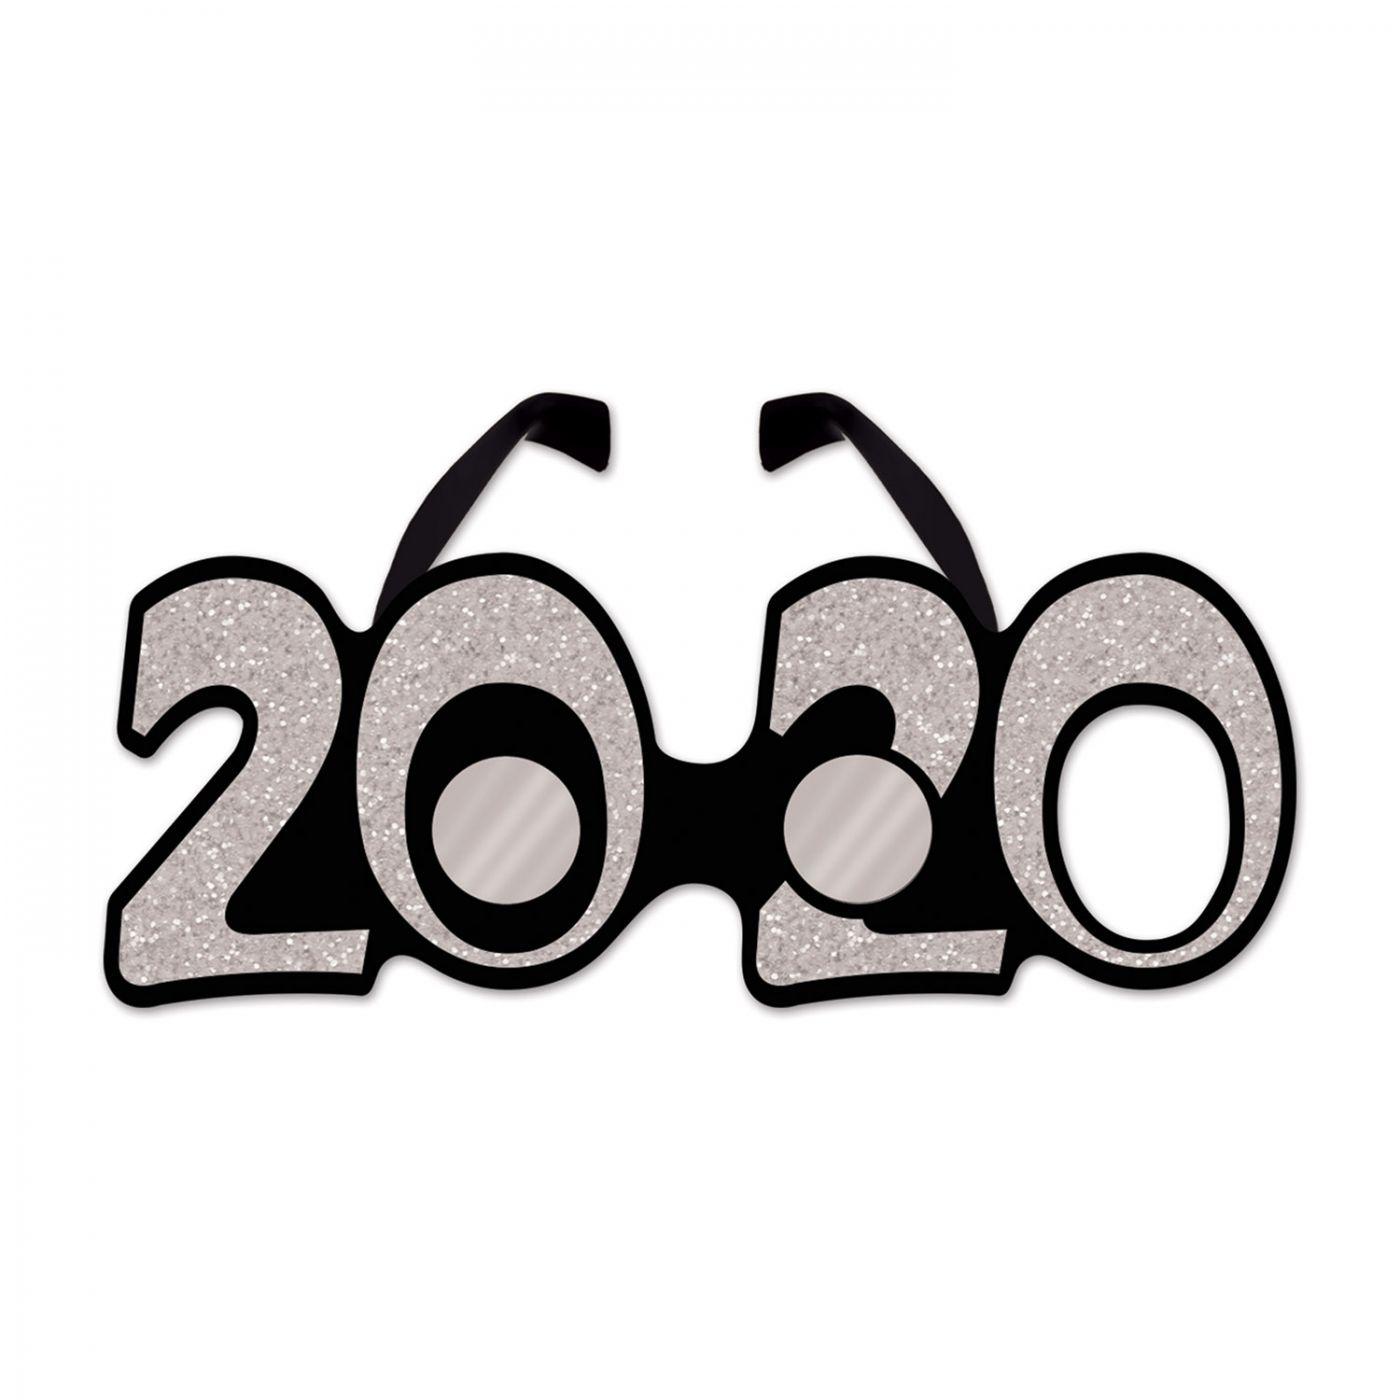 Image of  2020  Glittered Plastic Eyeglasses